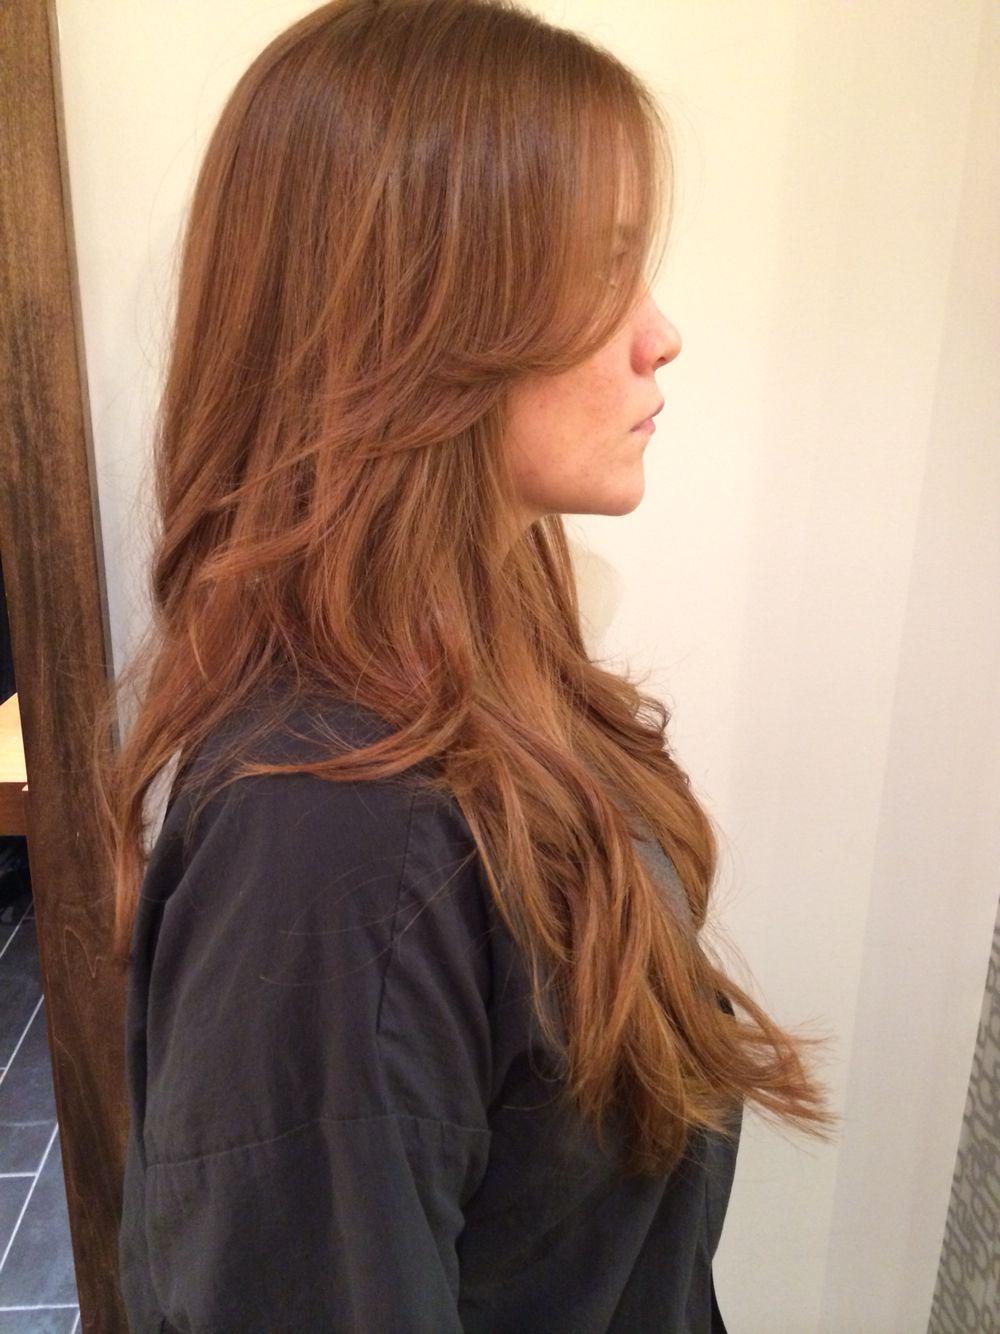 Haircut Red Hair Long Layers Bumble And Bumble Long Hair Long Hair Styles Red Hair Long Layers Hair Envy